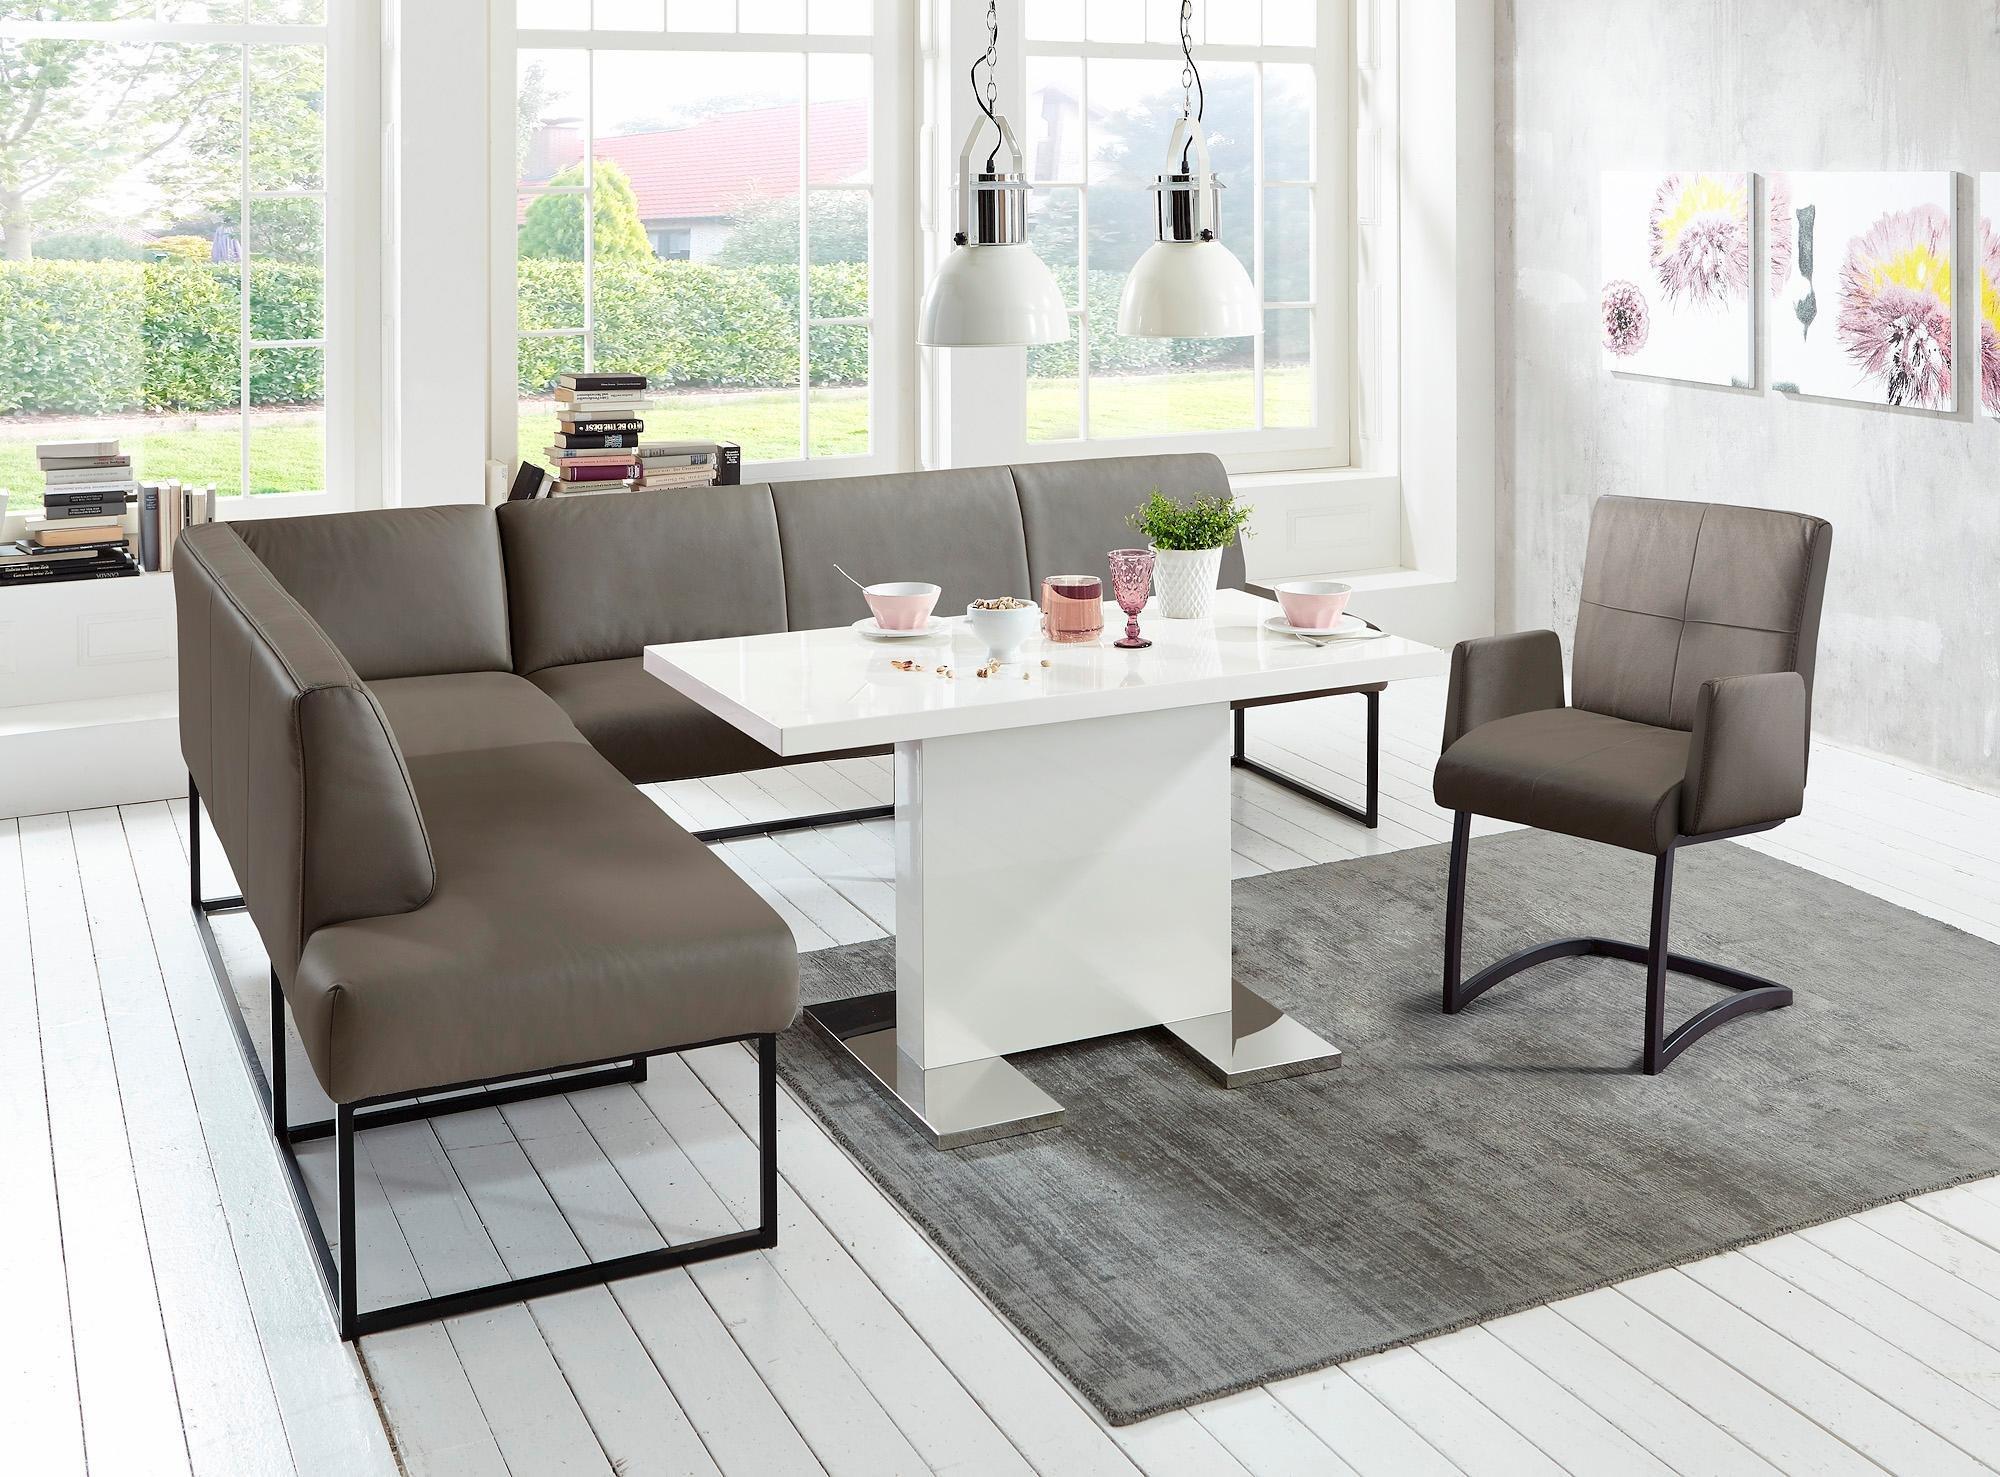 Full Size of Esszimmer Sofa Sofabank Leder 3 Sitzer Couch Grau Samt Vintage Ikea Landhausstil Modern Canape Schilling überzug 2 1 U Form Hussen Hülsta Rund Vitra Delife Sofa Esszimmer Sofa